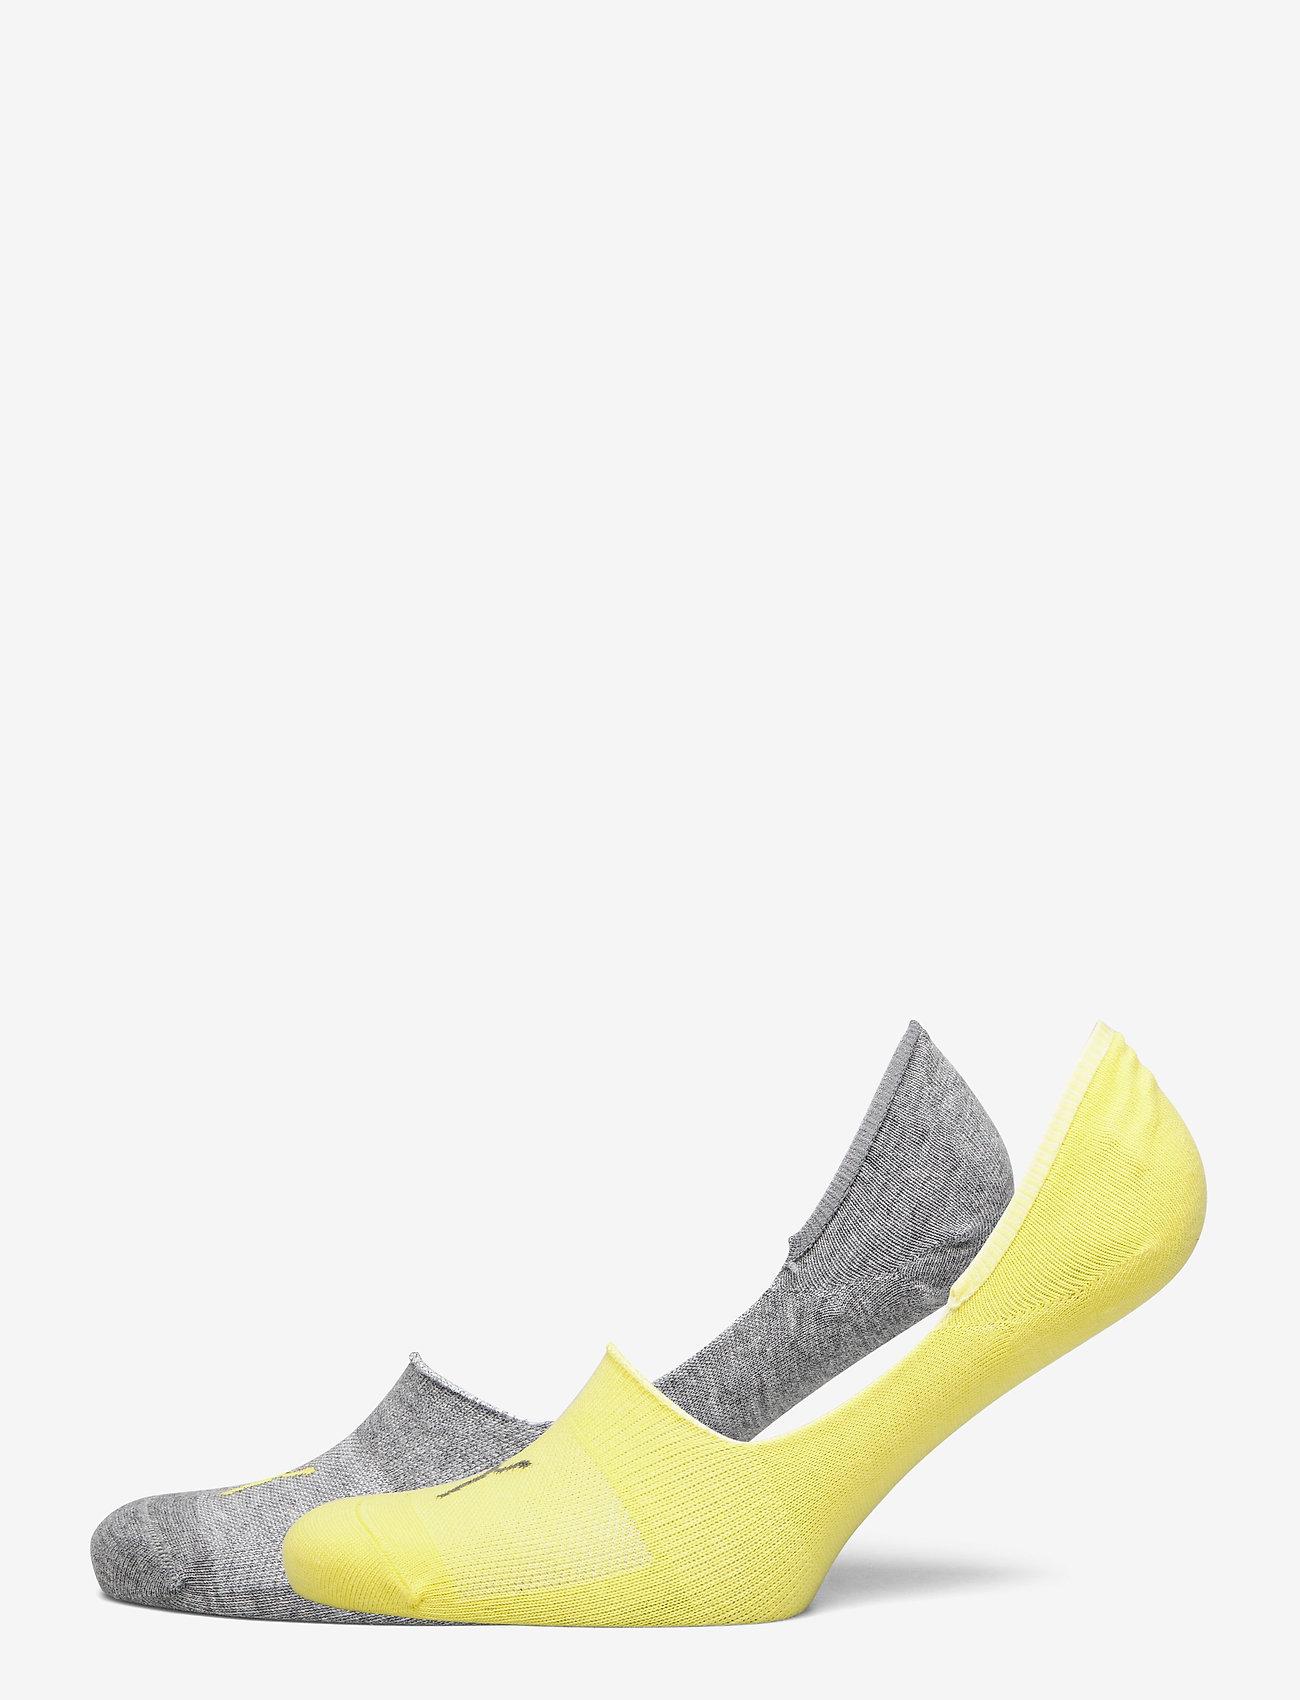 PUMA - PUMA FOOTIE 2P UNISEX - kousen - yellow - 0